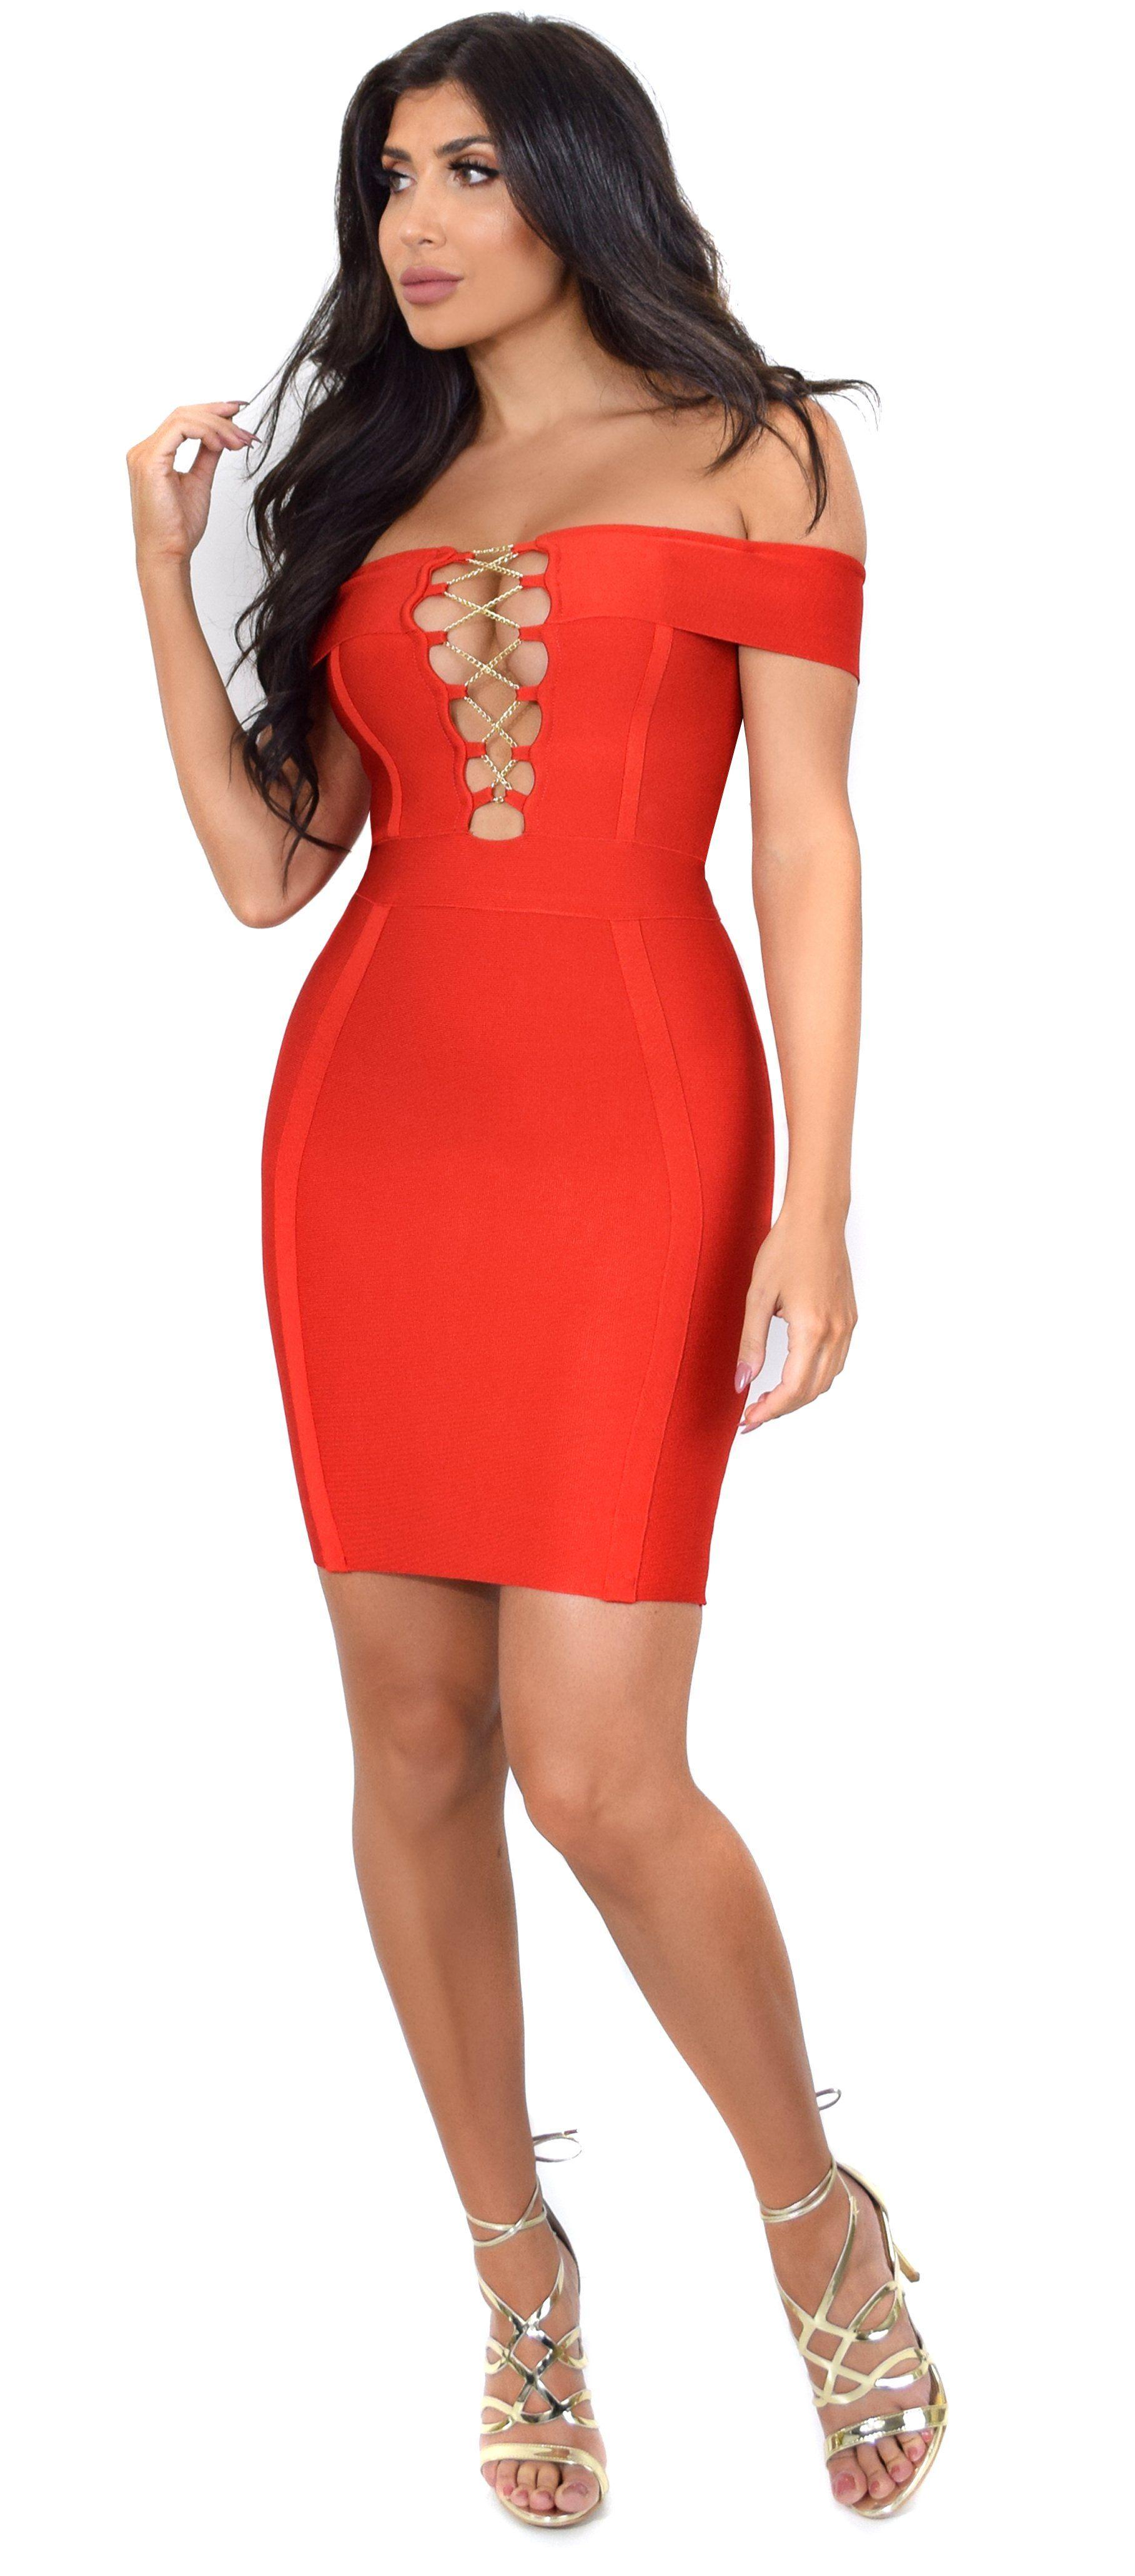 Frida red off shoulder gold chain criss cross bandage dress